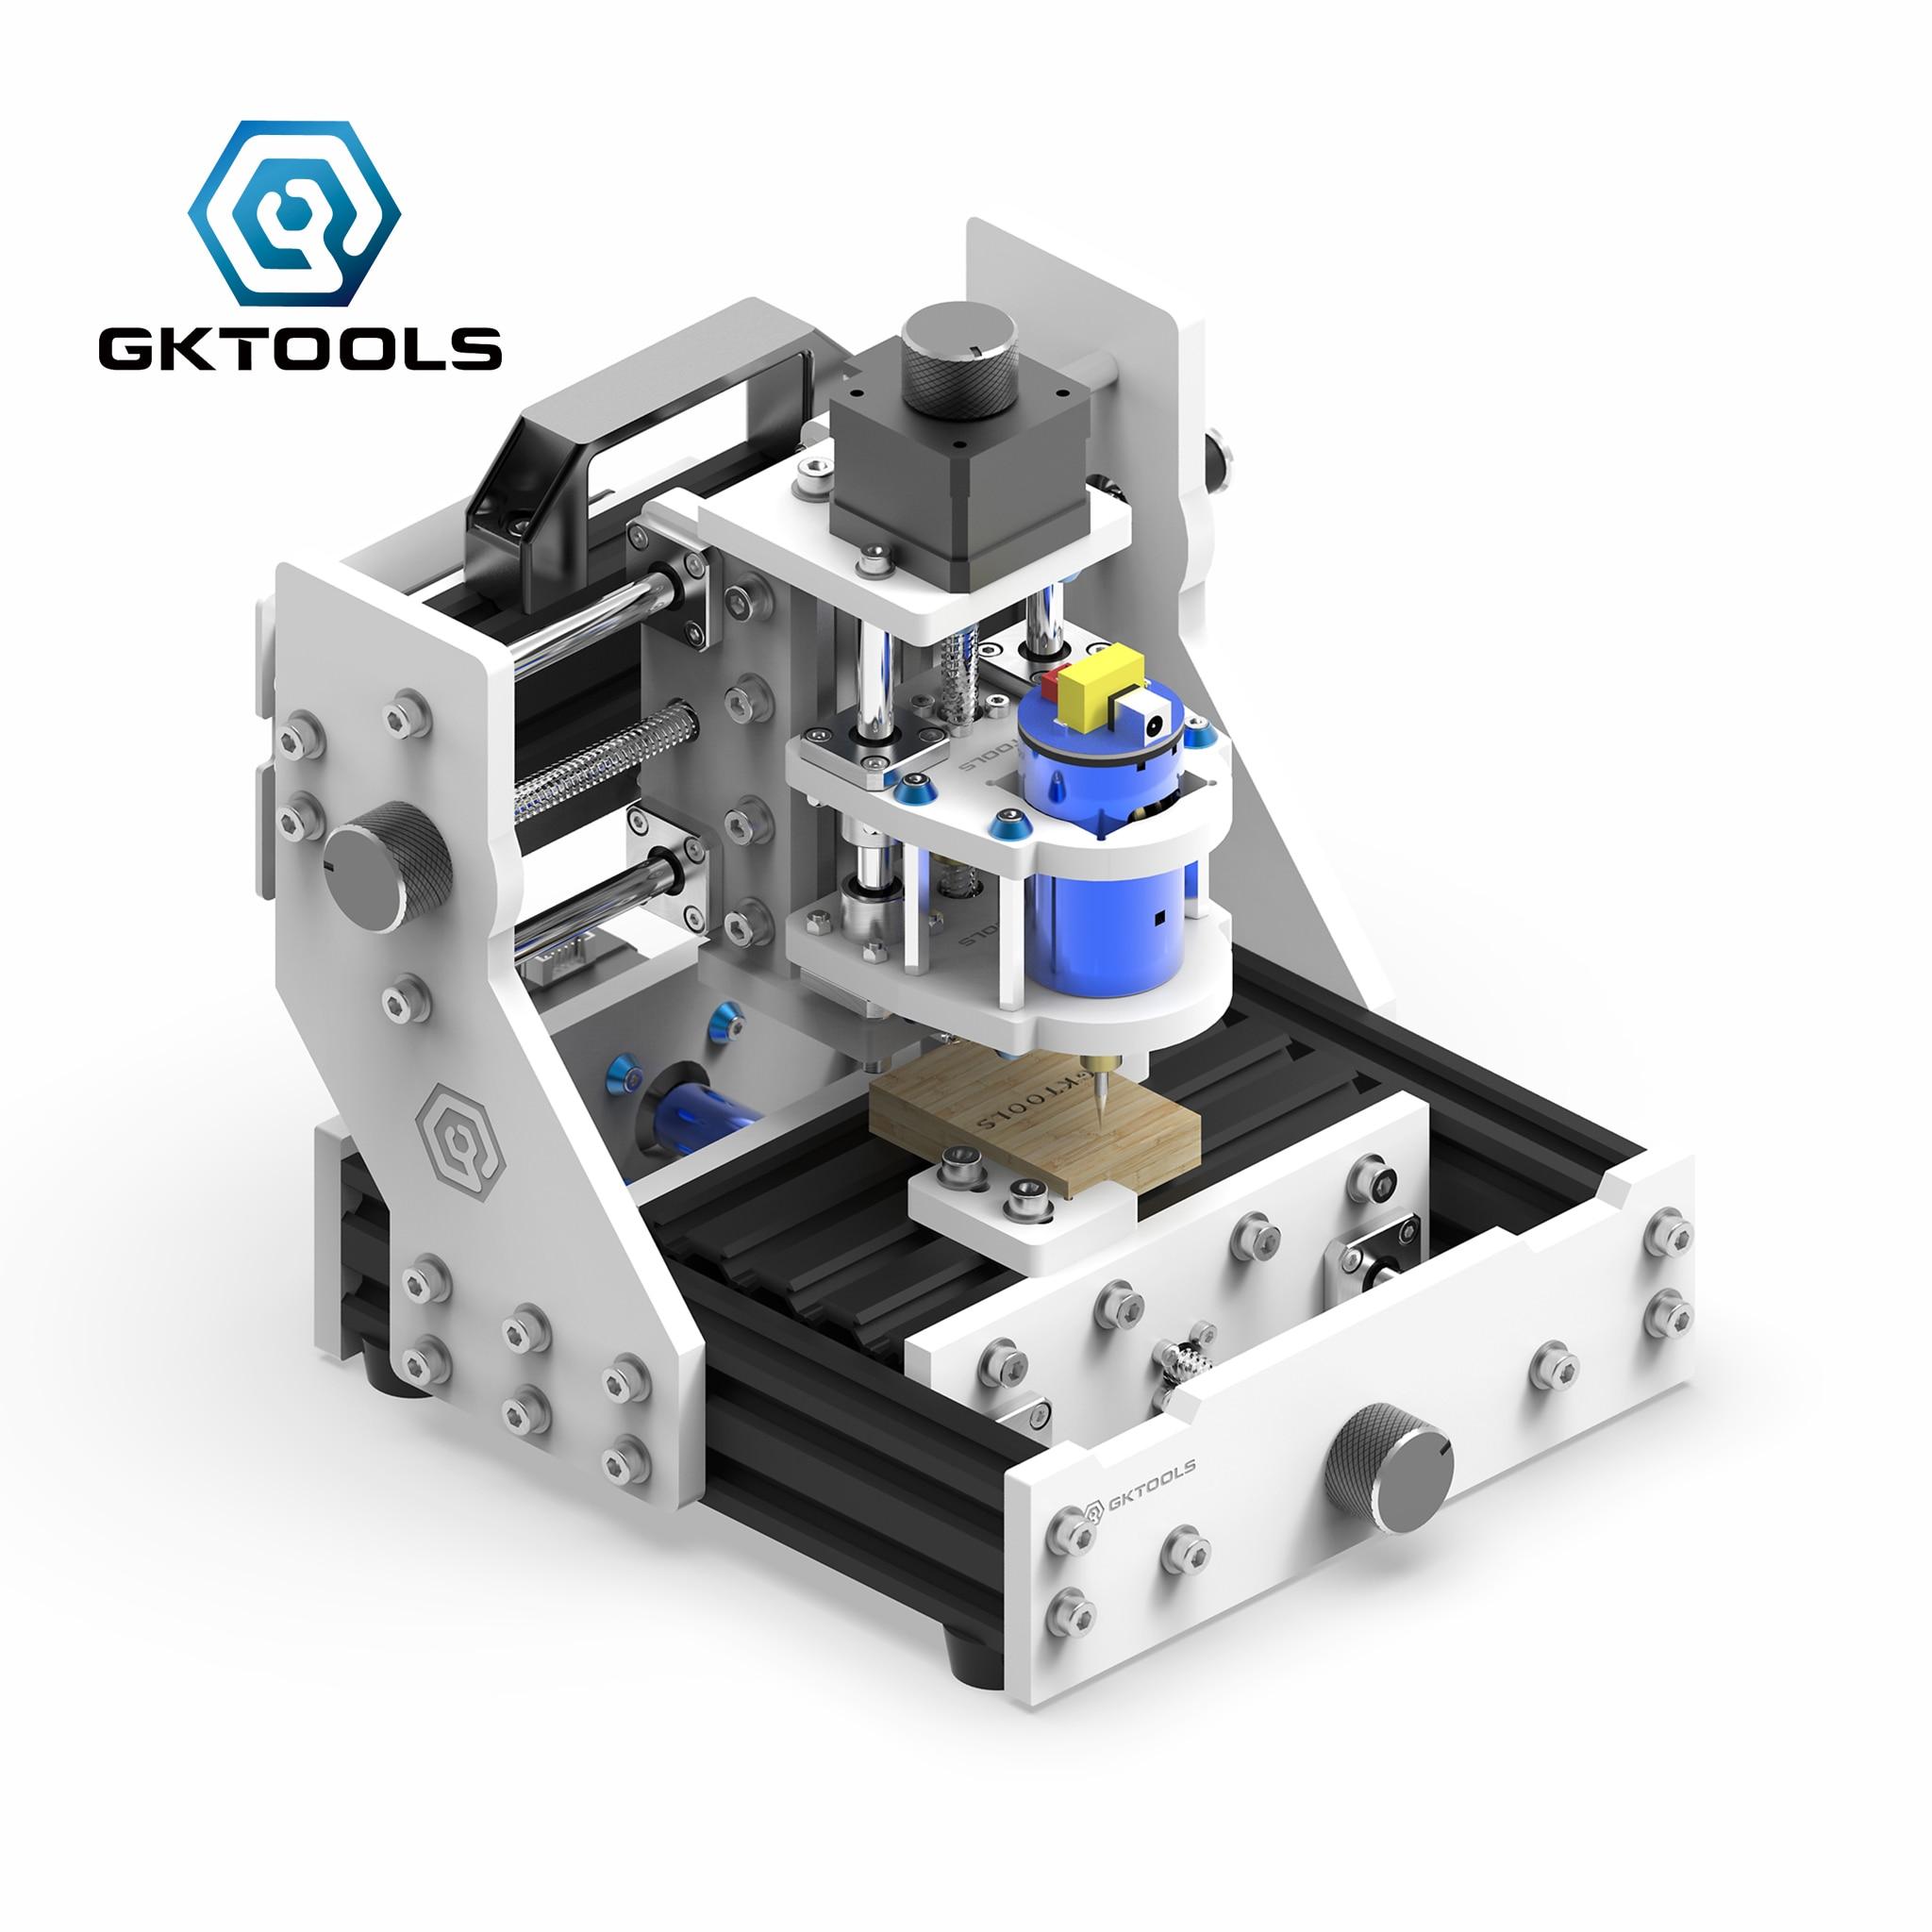 GKTOOLS CNC 1309 DIY GRBL Desktop Hobby Mini Gravur Holz Router Carving PCB Fräsen Mühle Cutter Stecher Maschine